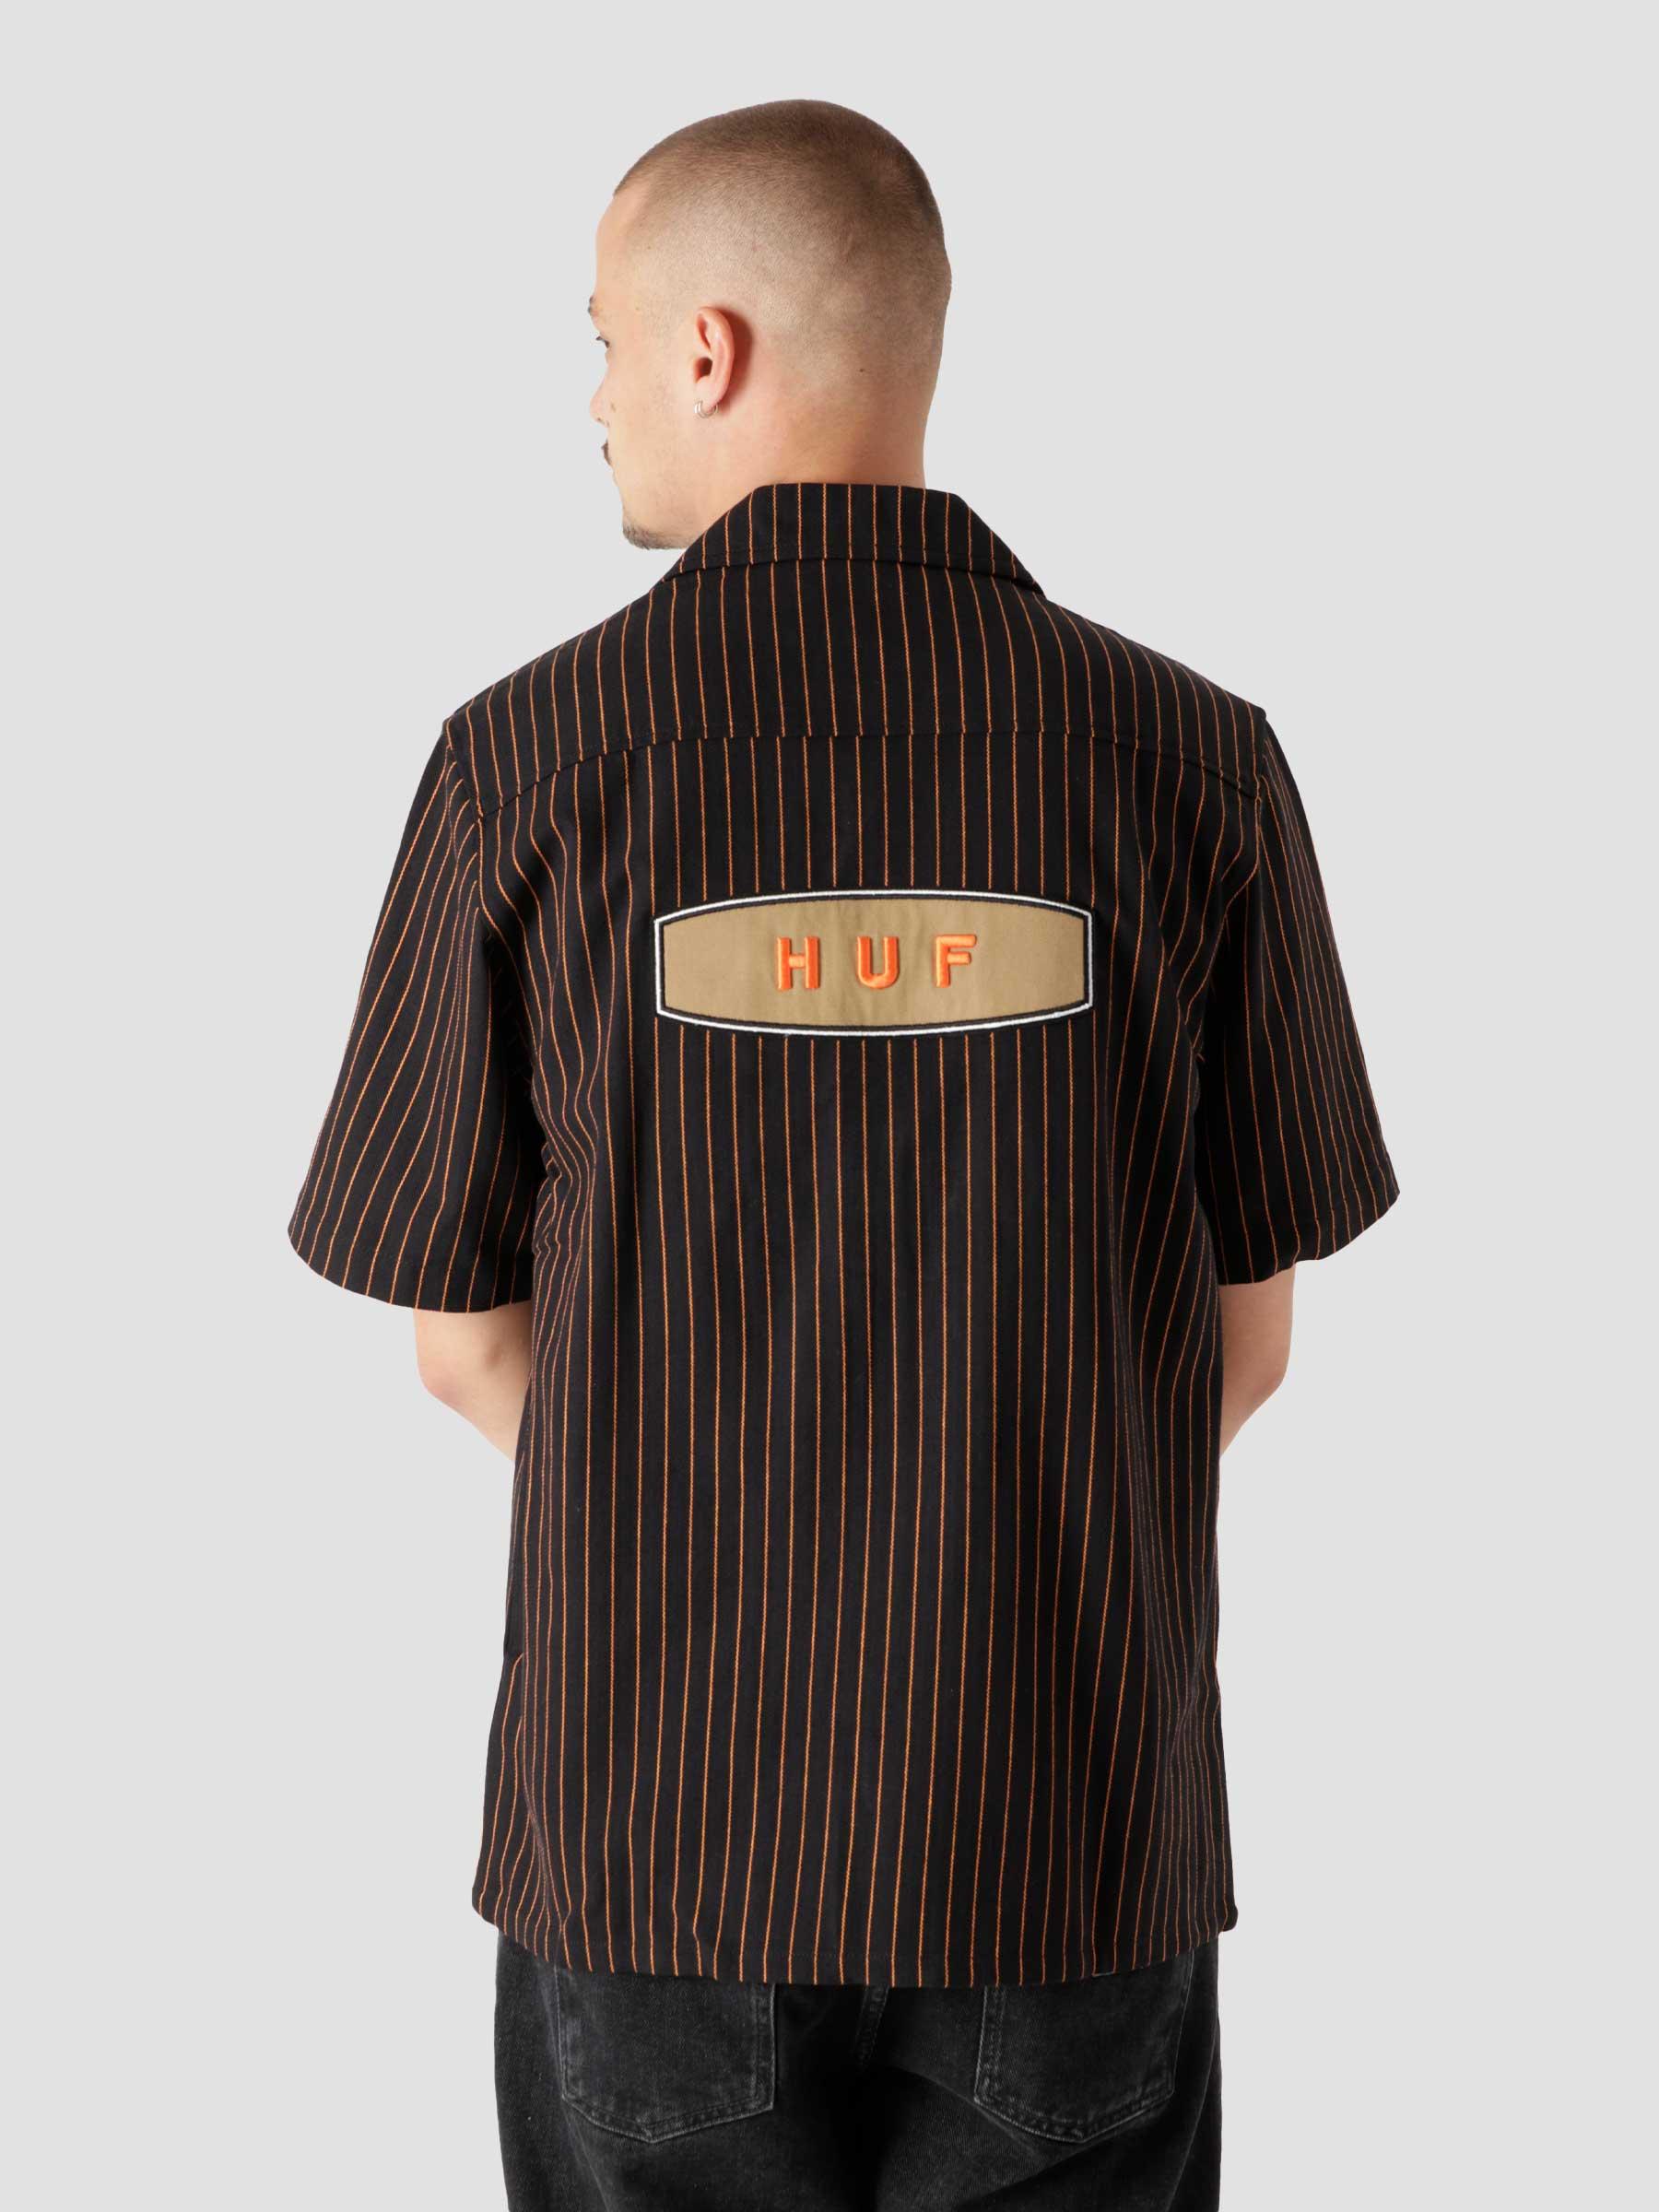 Billy S/S Work Shirt Black BU00107